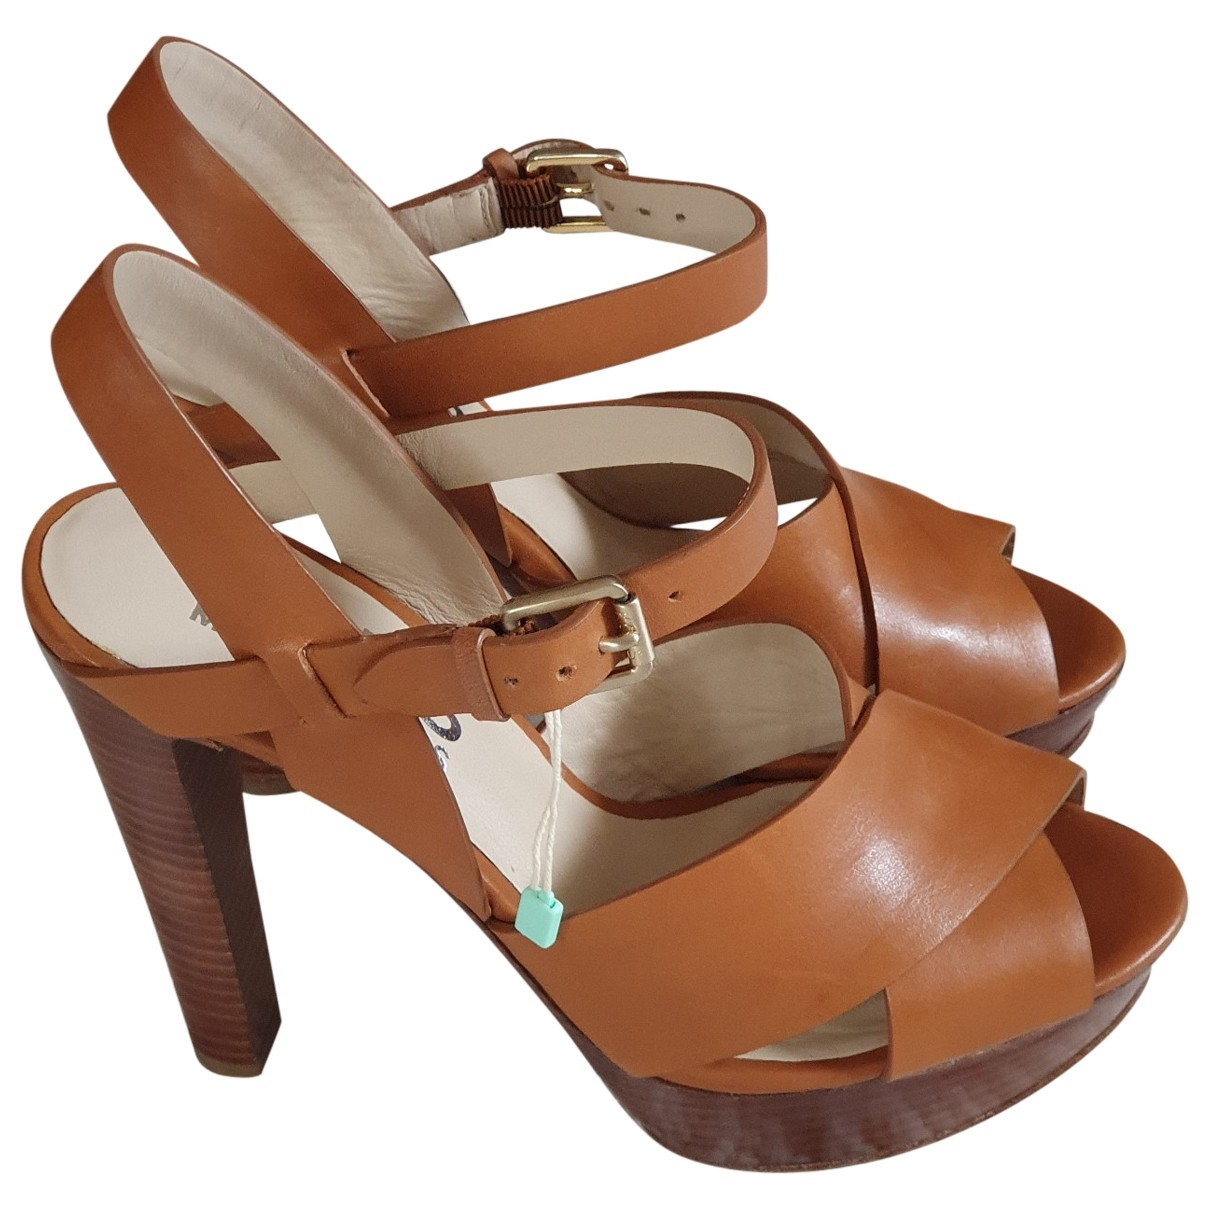 Michael Kors \N Camel Leather Sandals for Women 37 EU